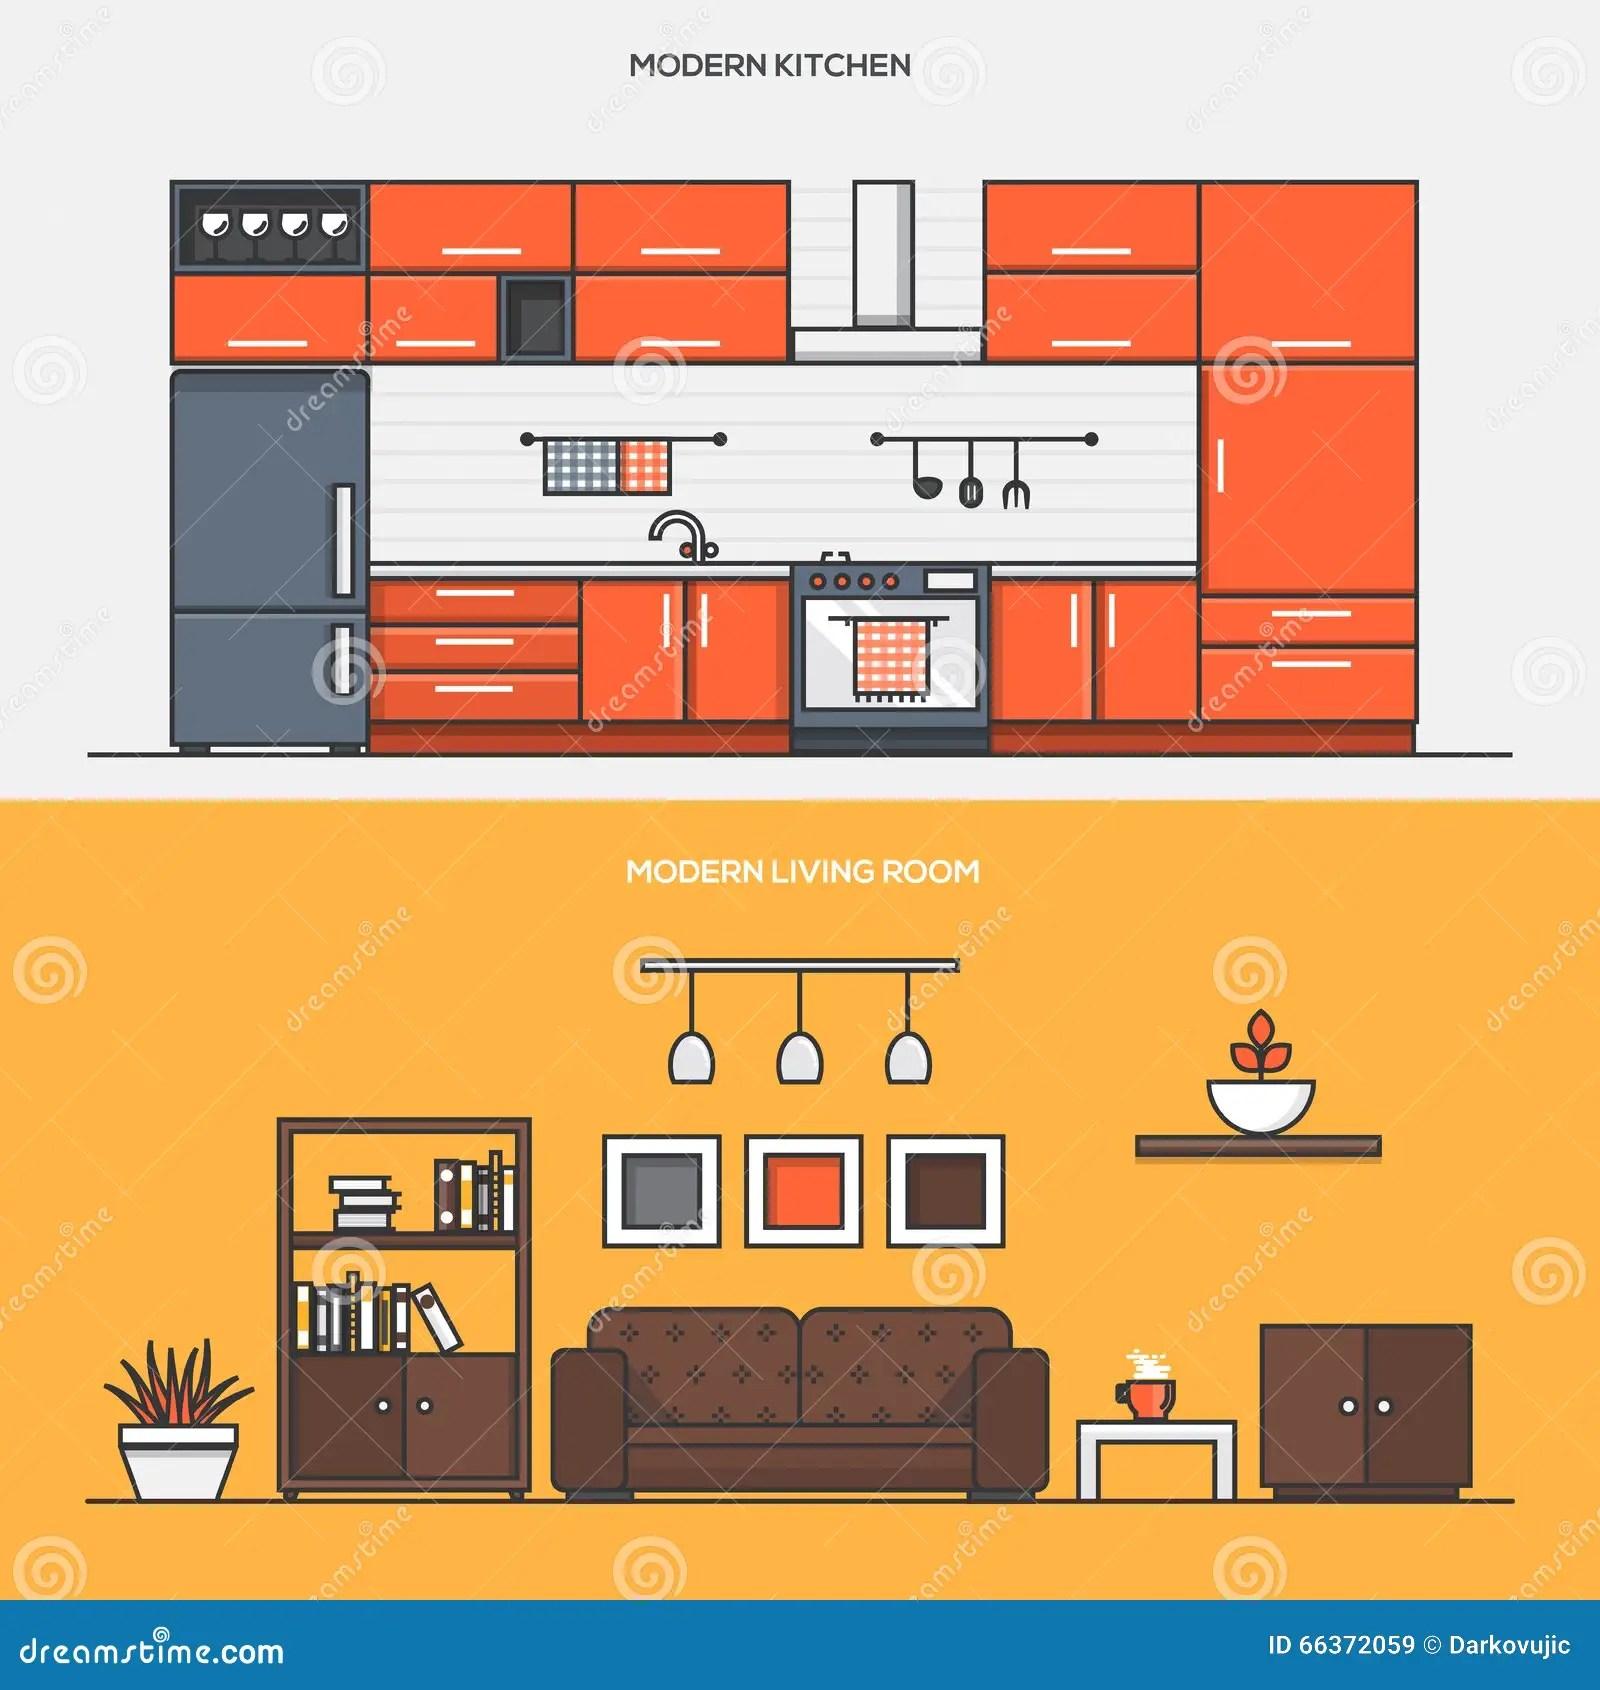 set flat line color banners design concepts modern kitchen modern living room web banner printed materials 66372059